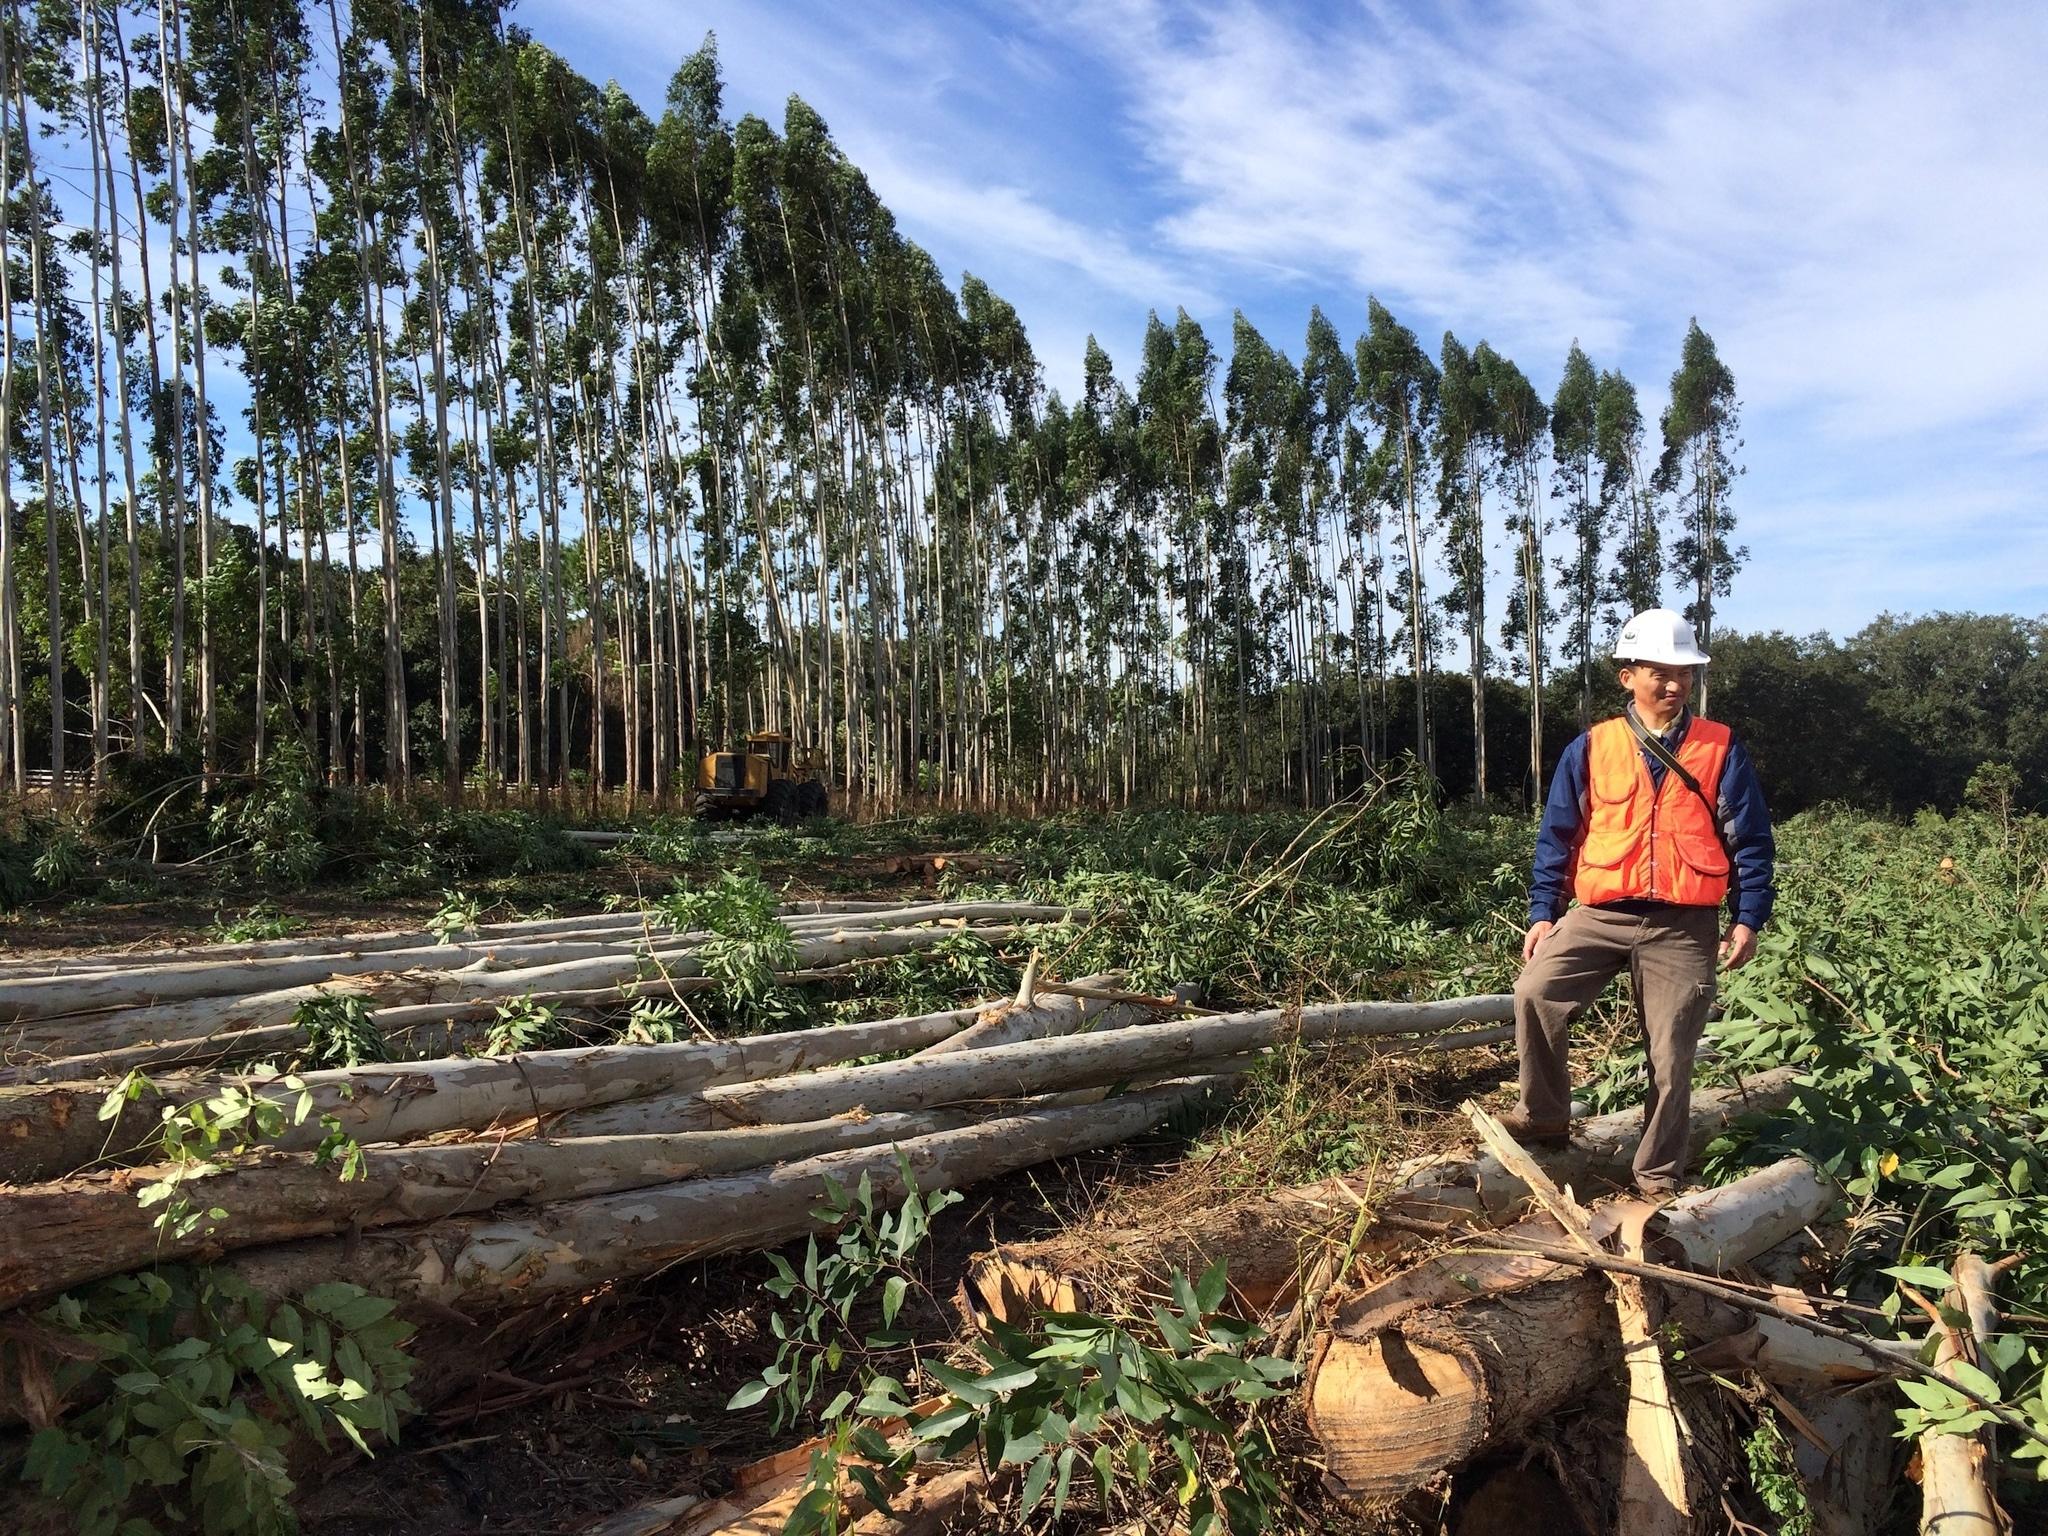 Harvesting trees 6